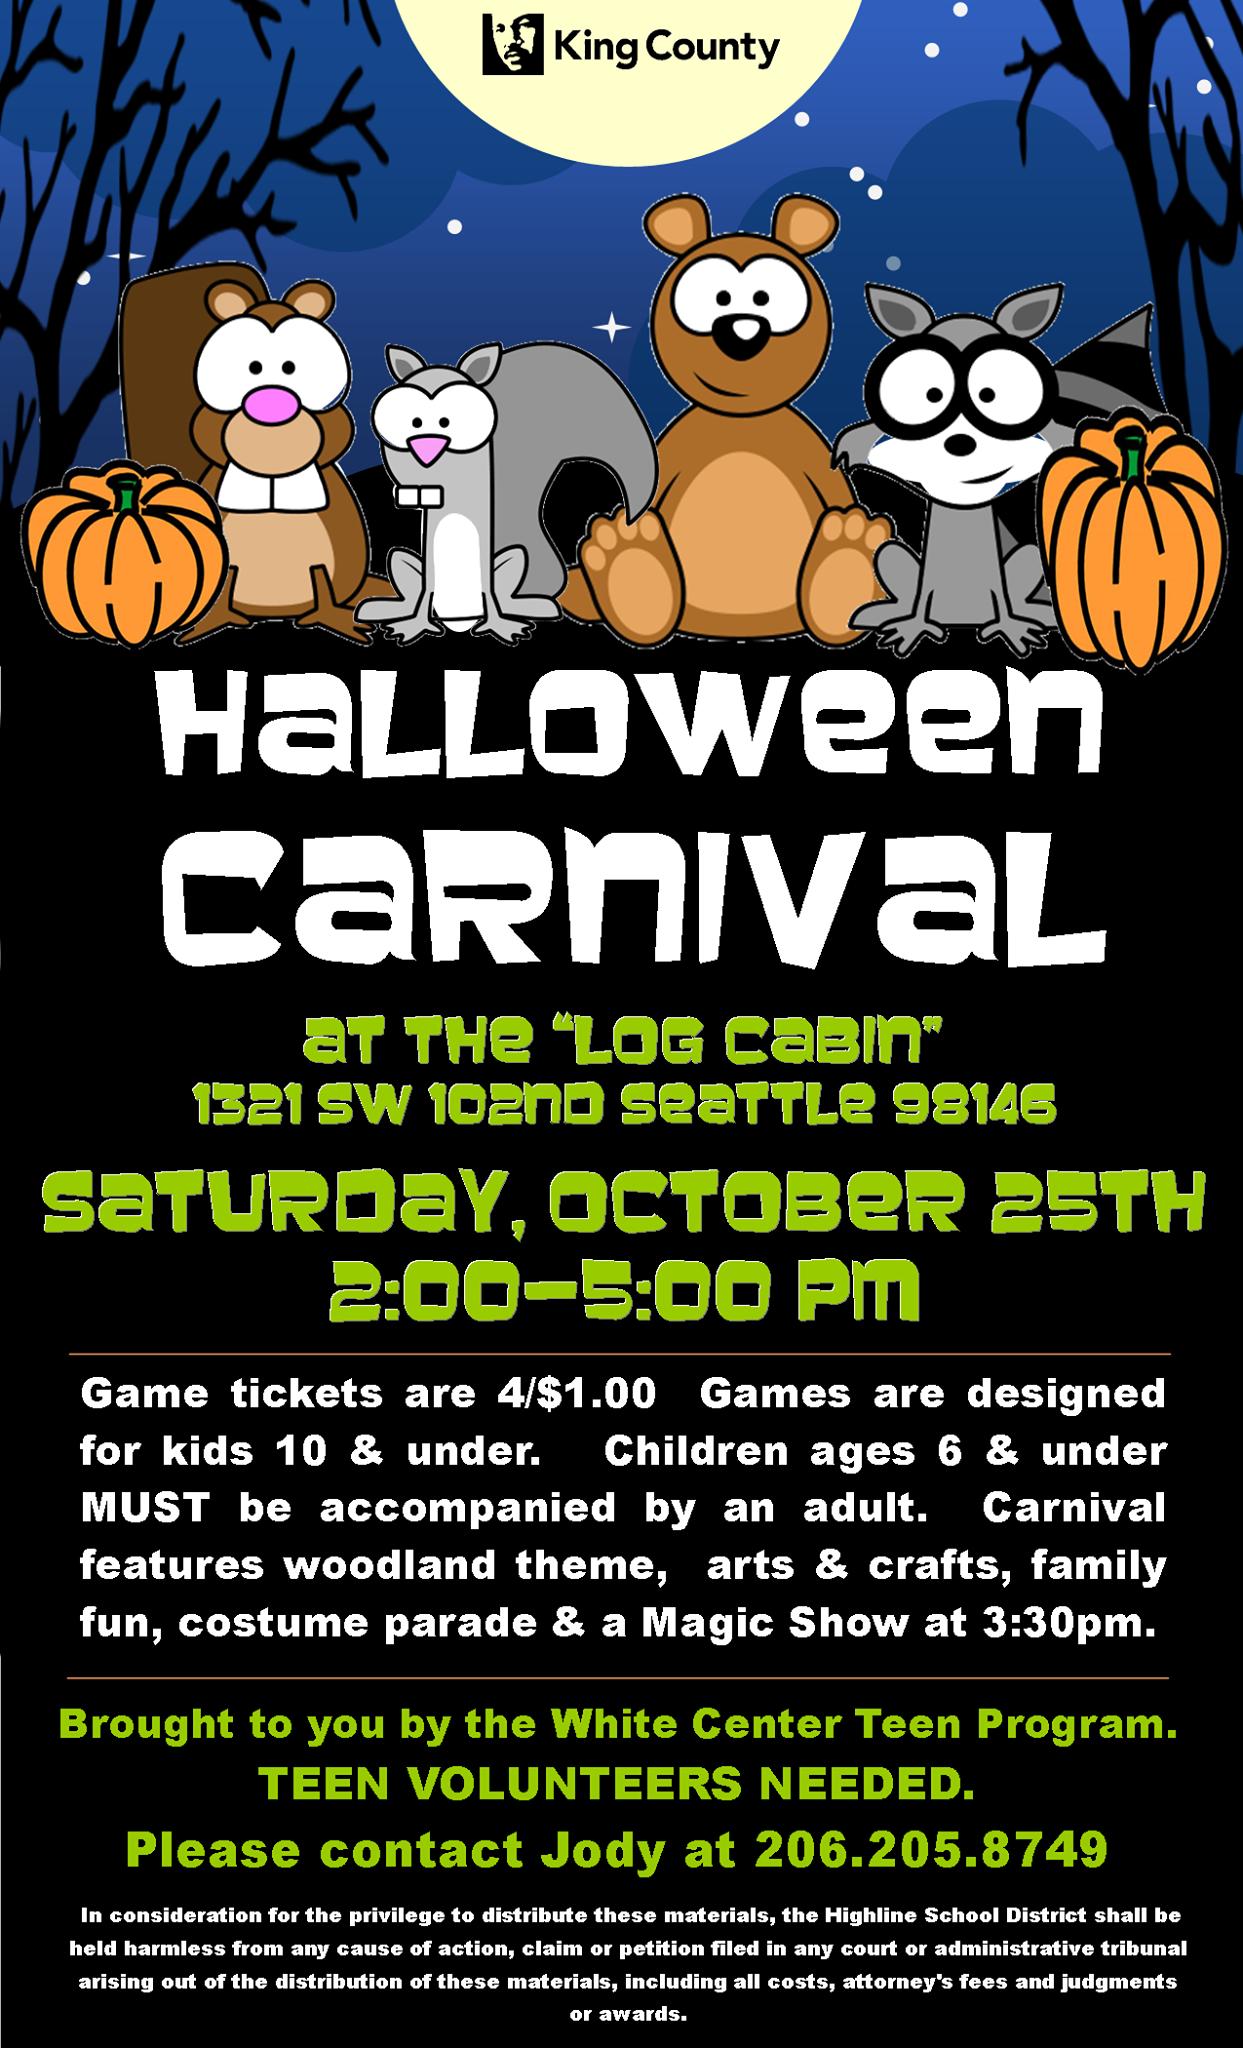 white center teen program brings the halloween carnival this